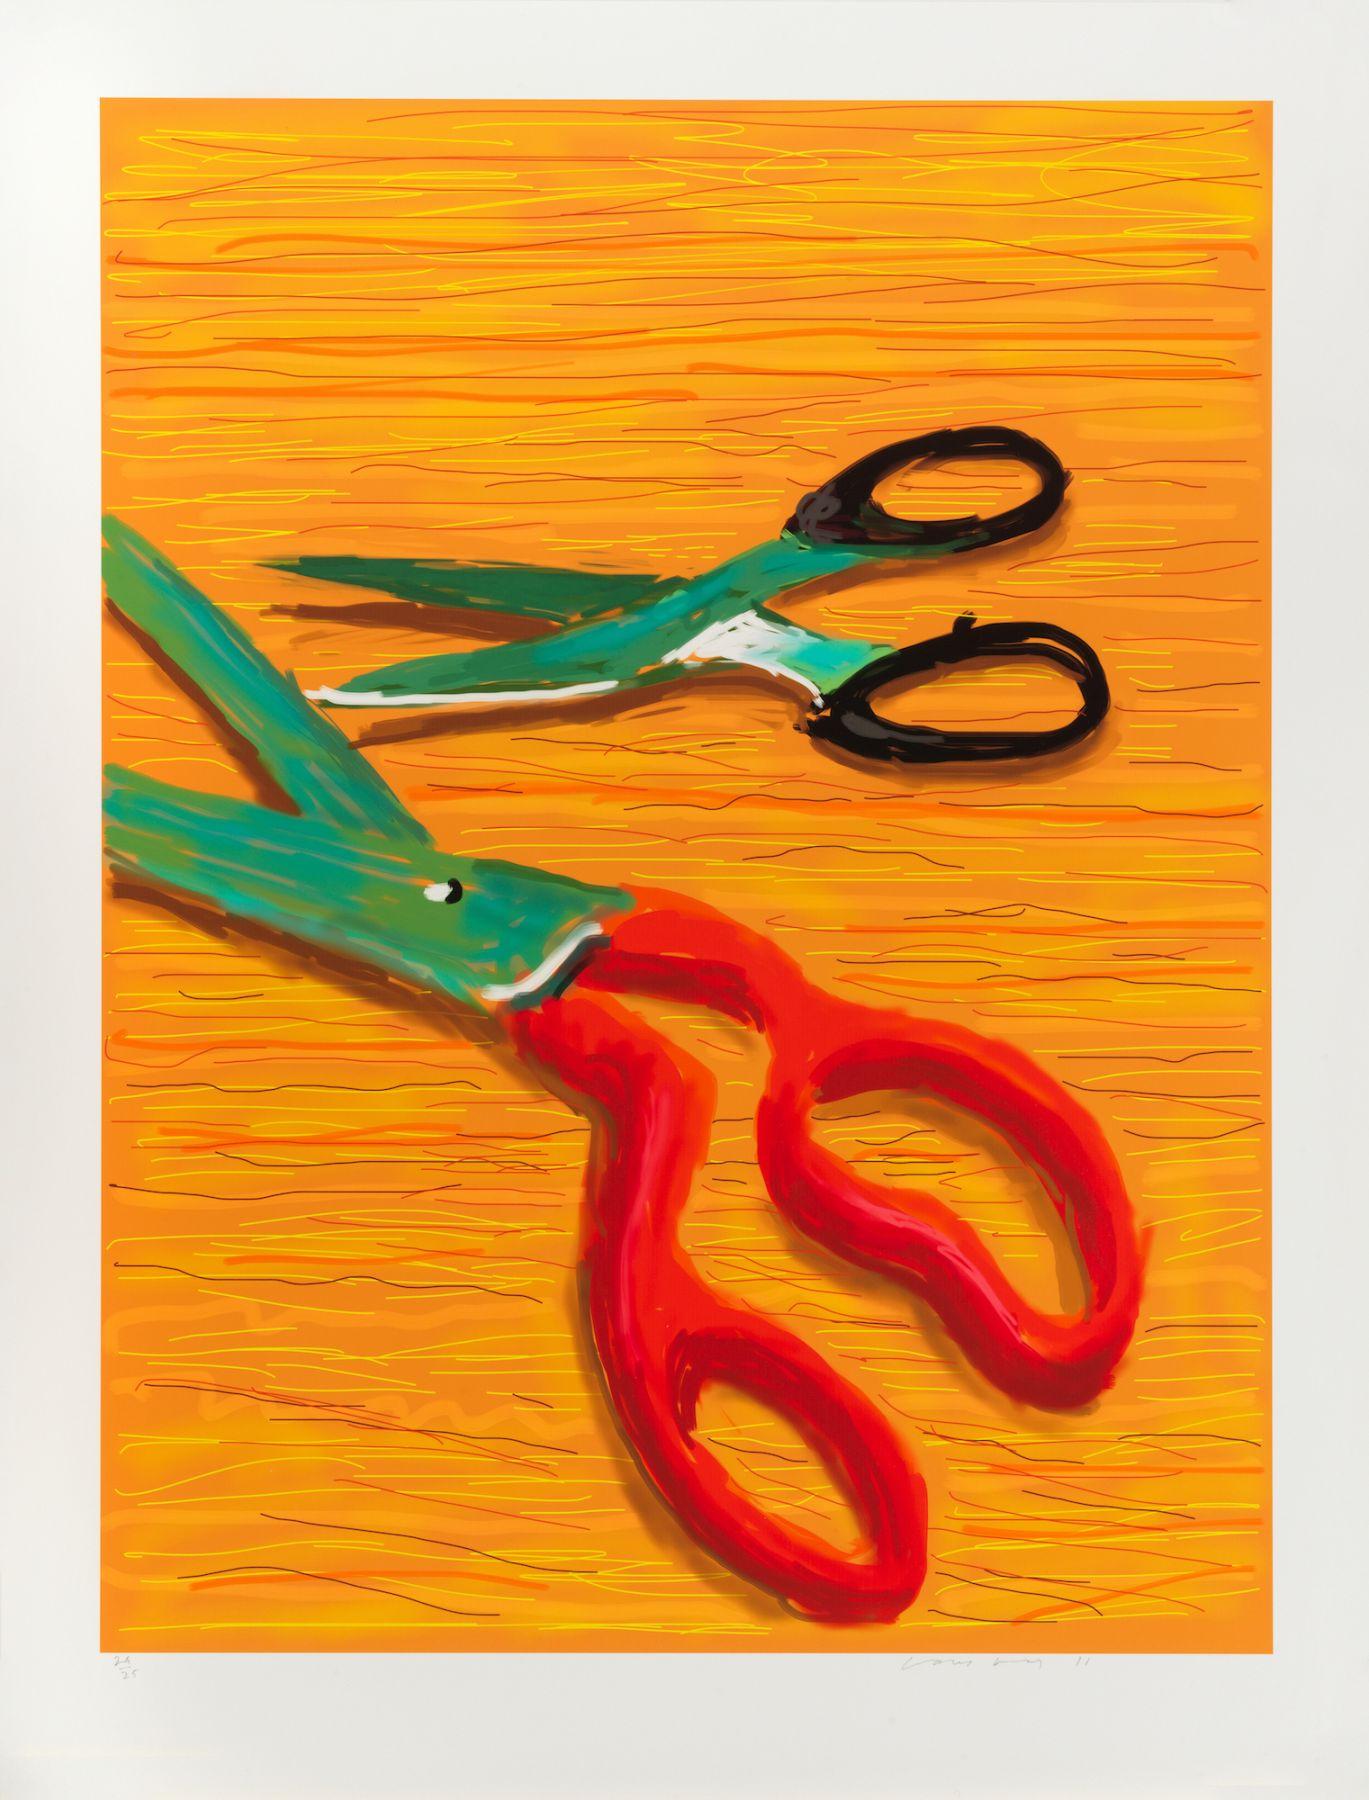 Hockney, Double Portrait, 2011